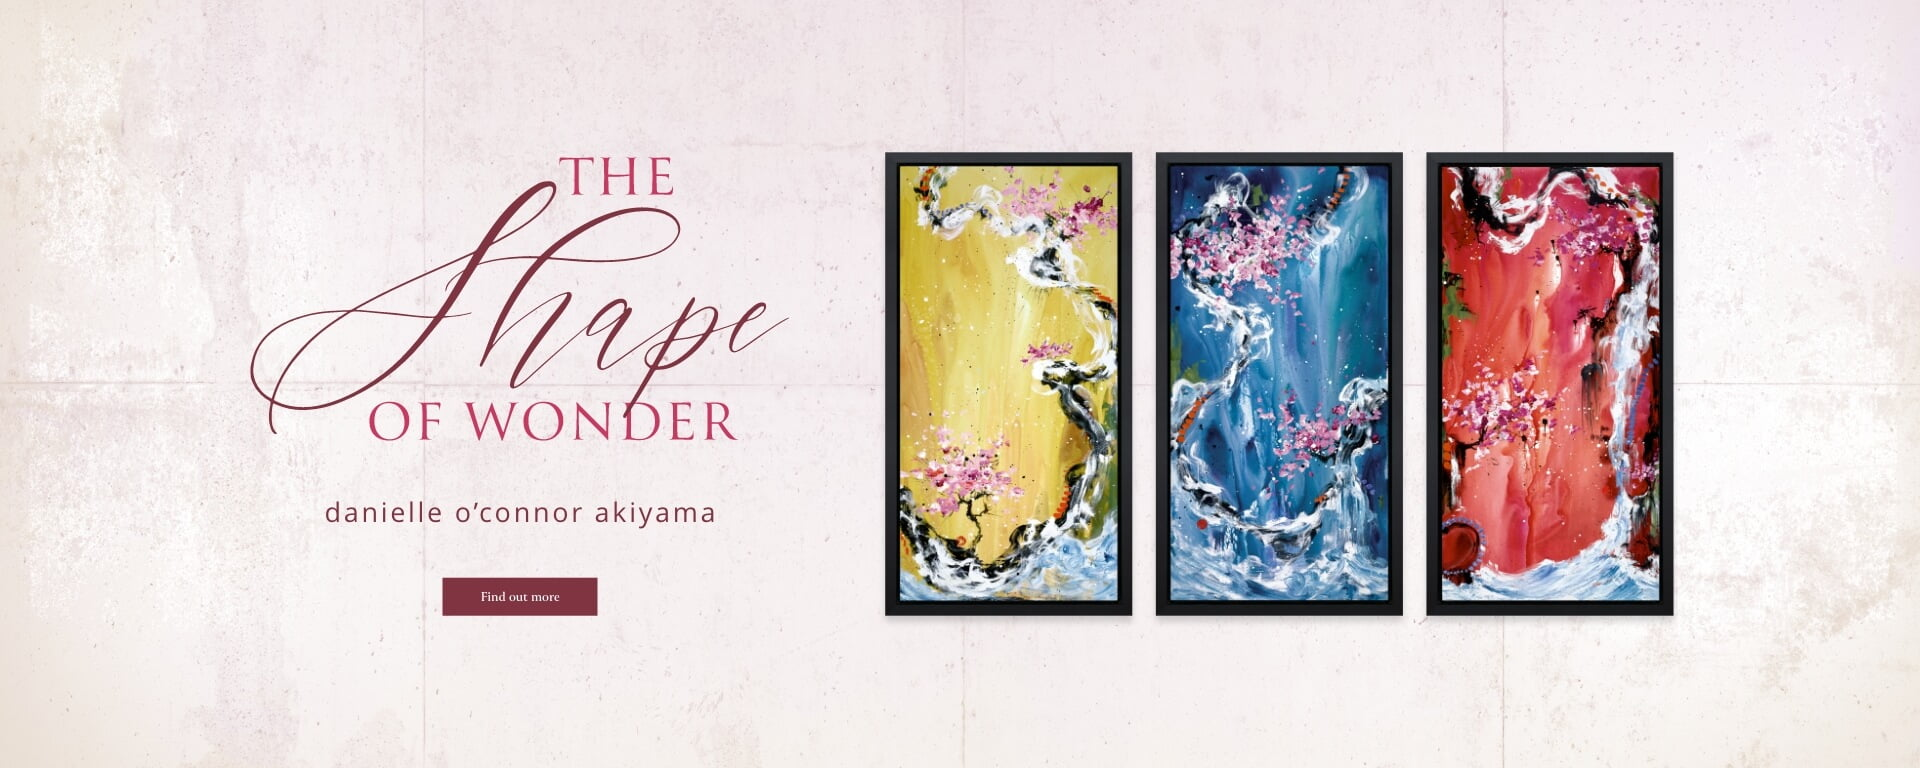 The 'Trilogy of Wonder' by Danielle O'Connor Akiyama